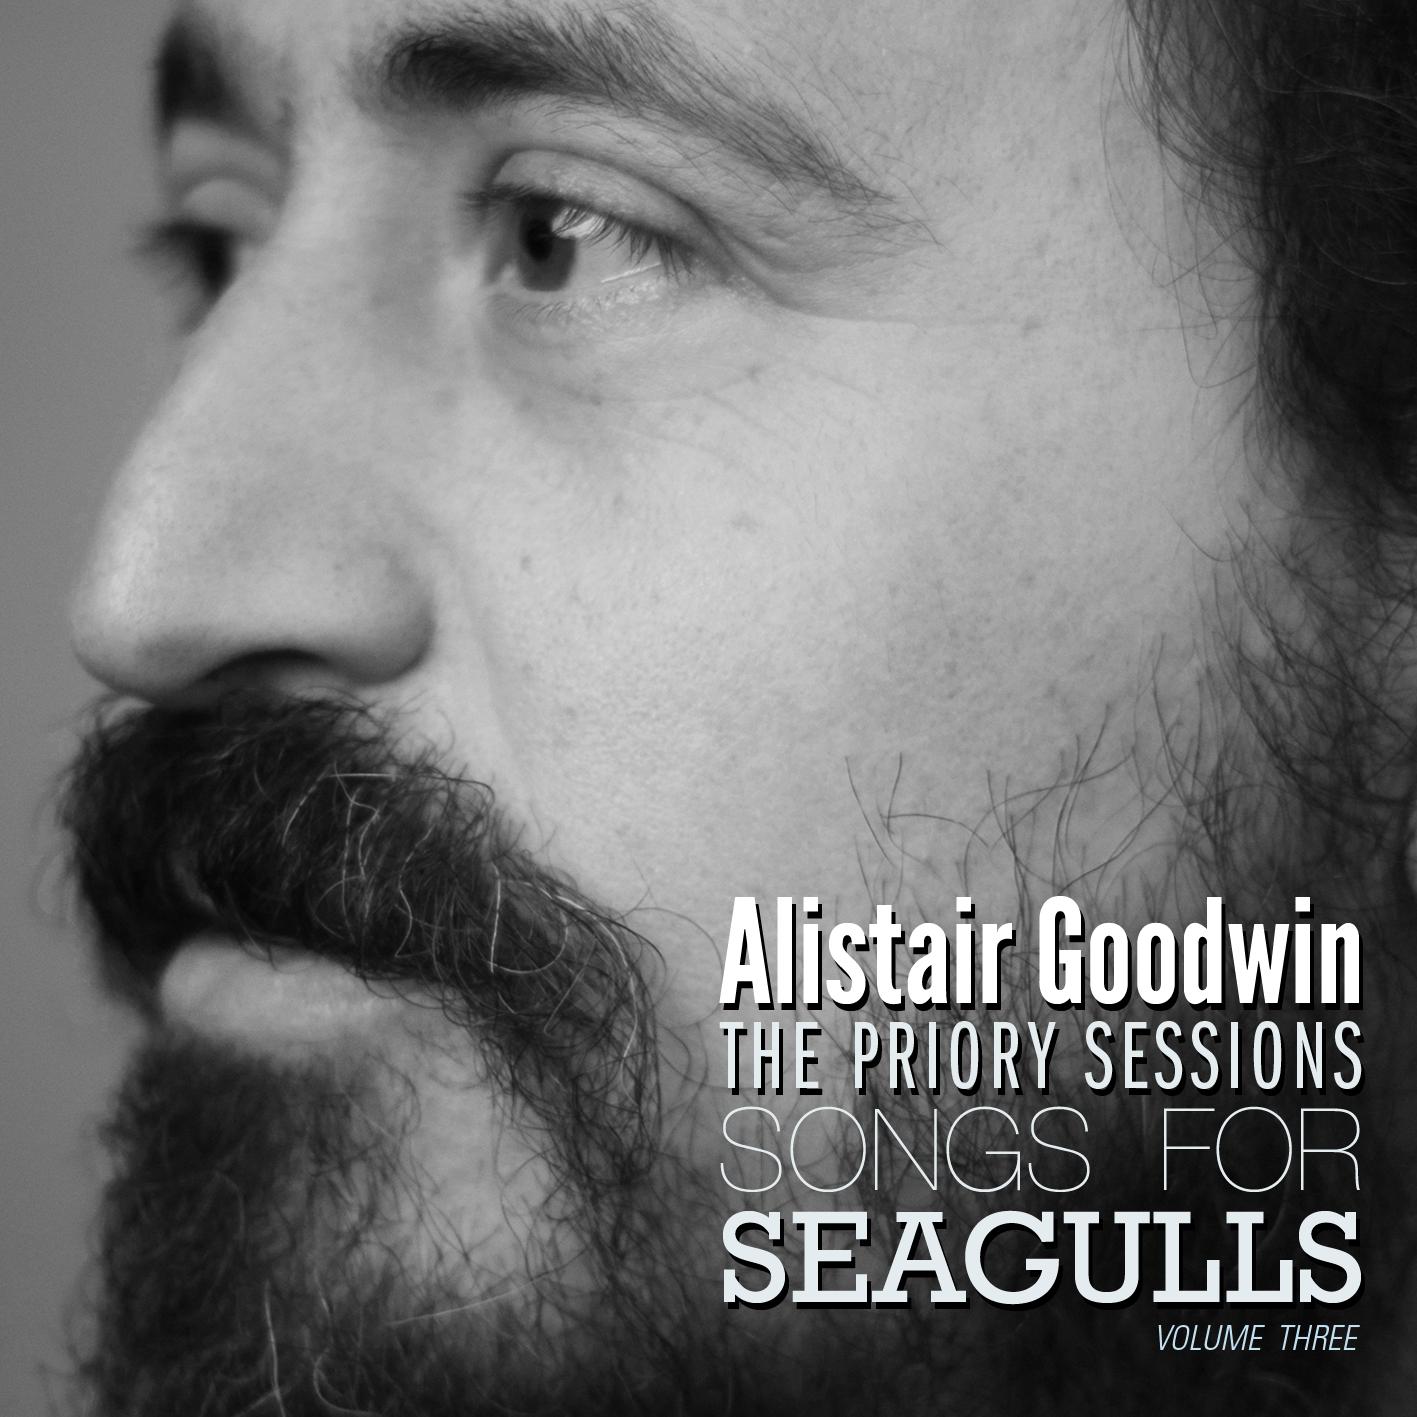 Alistair Goodwin